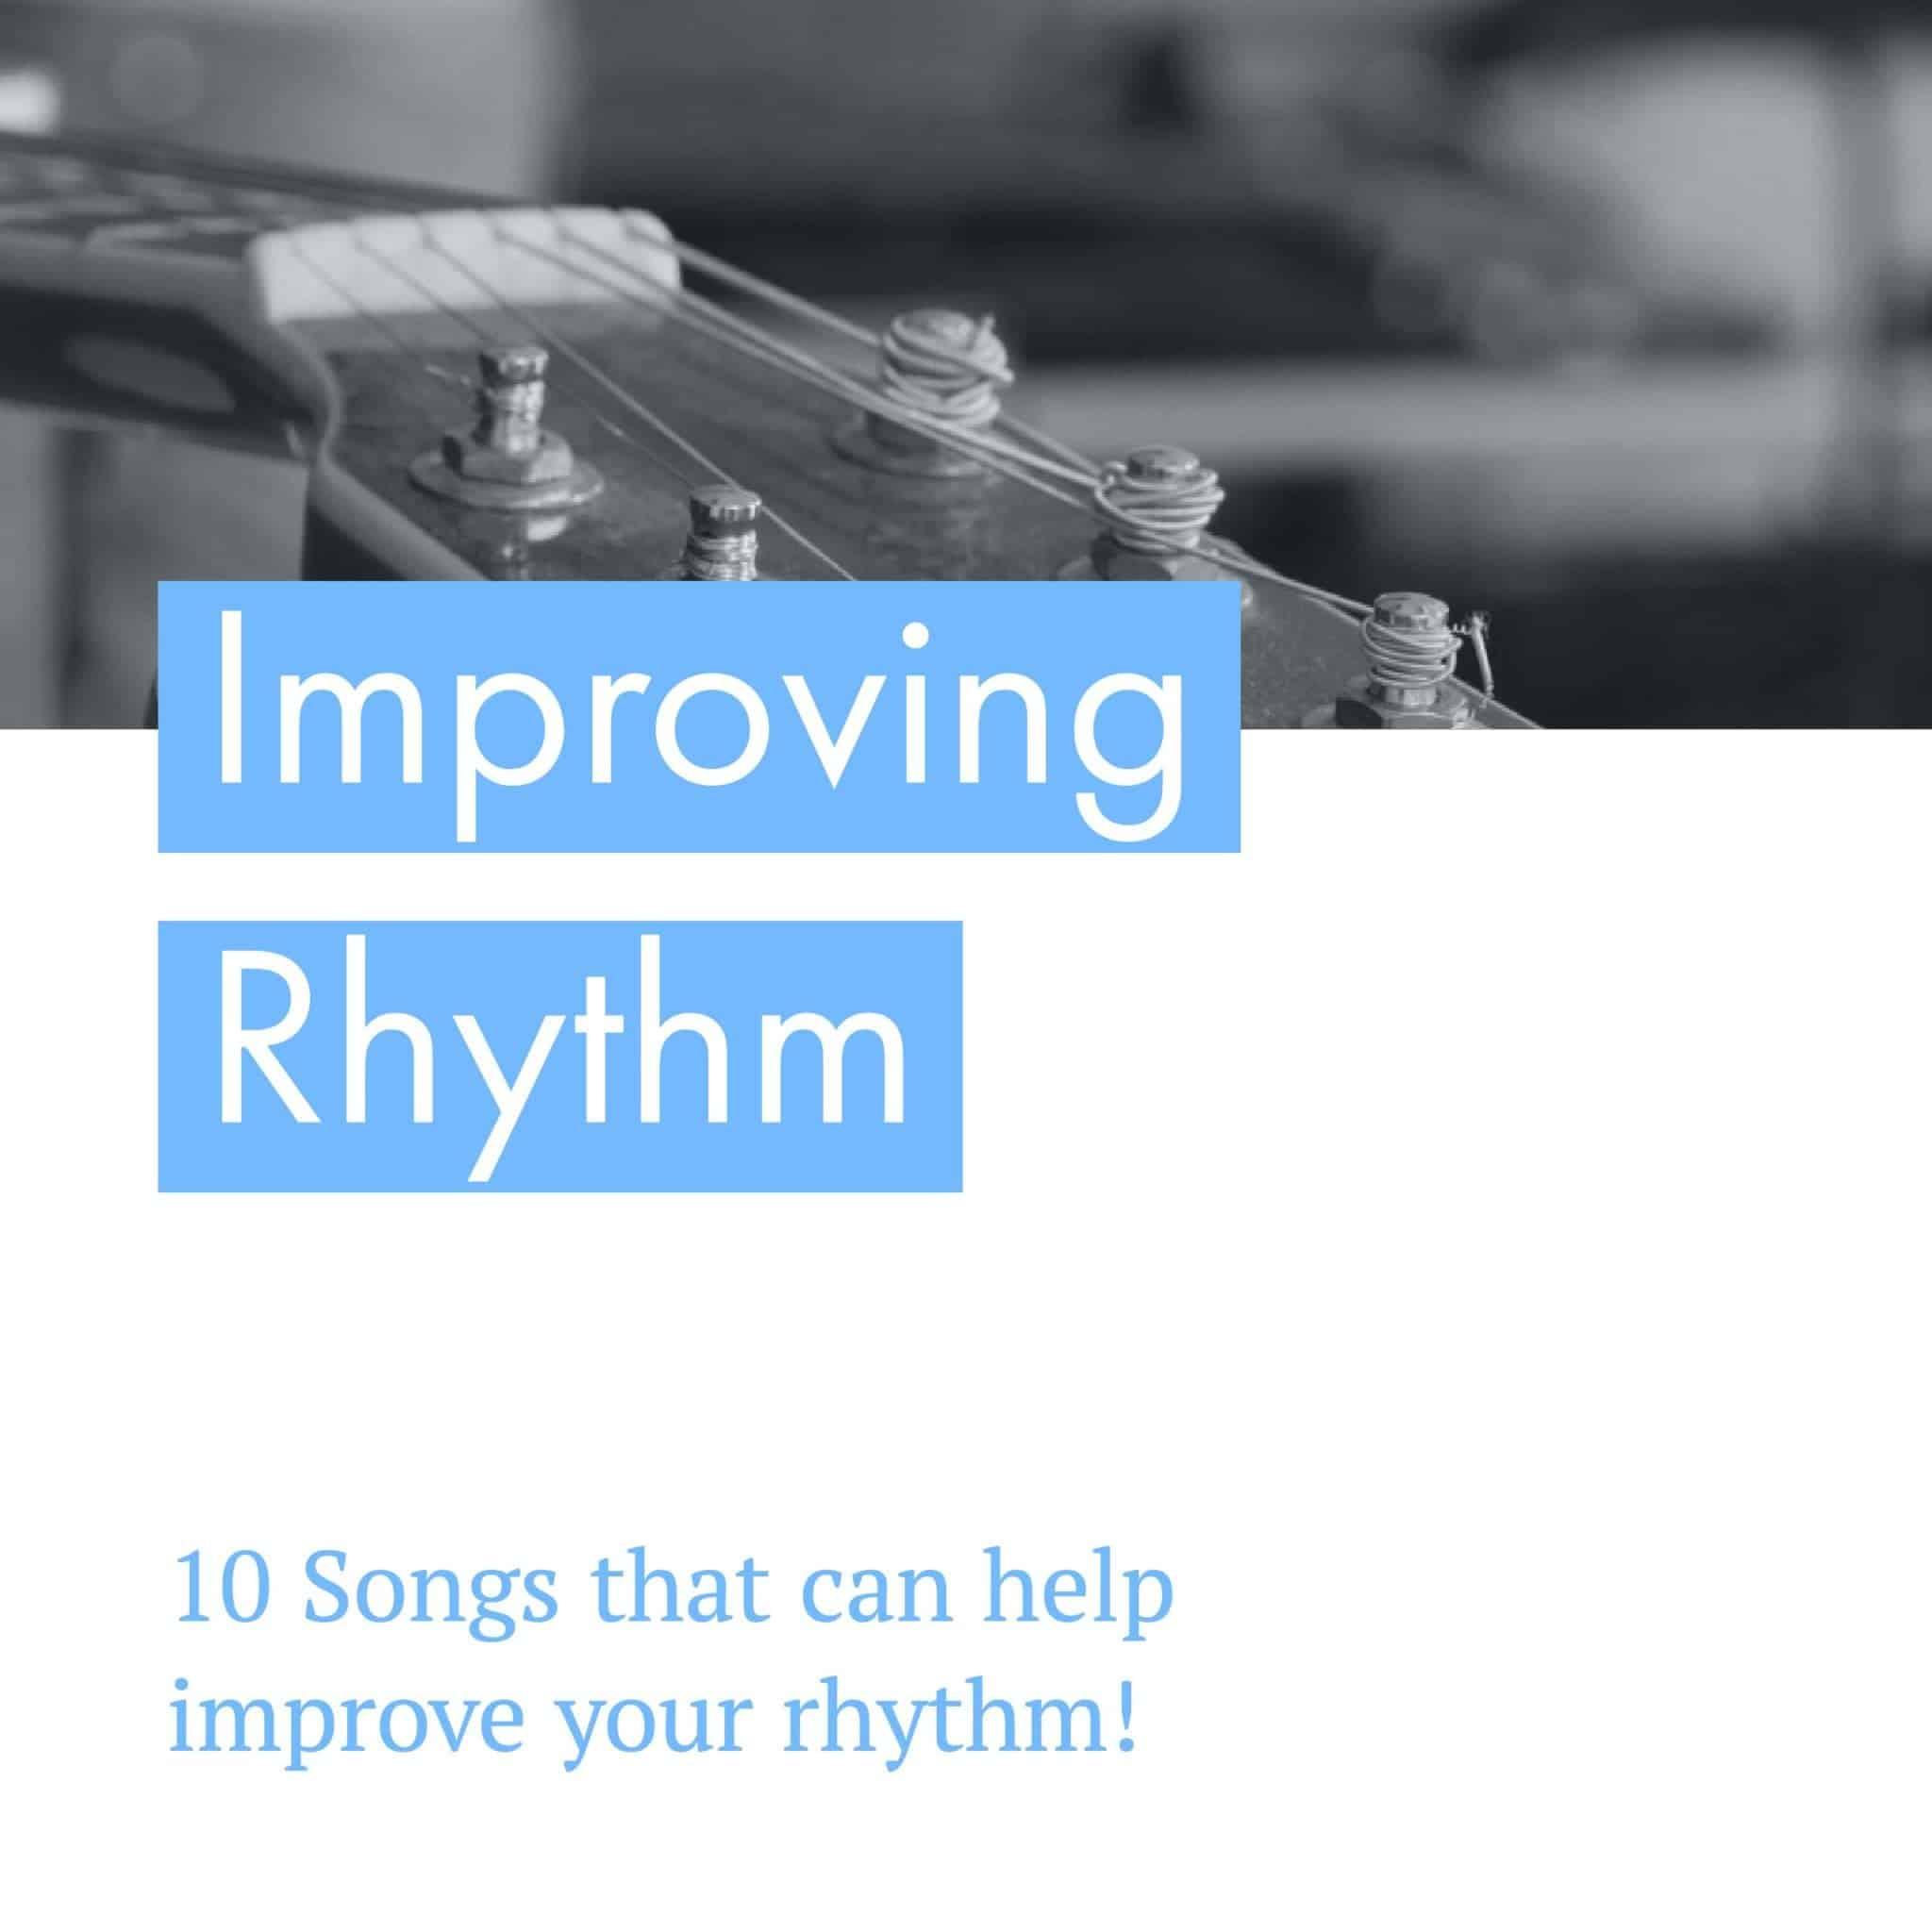 10 Songs that Help Improve Your Rhythm